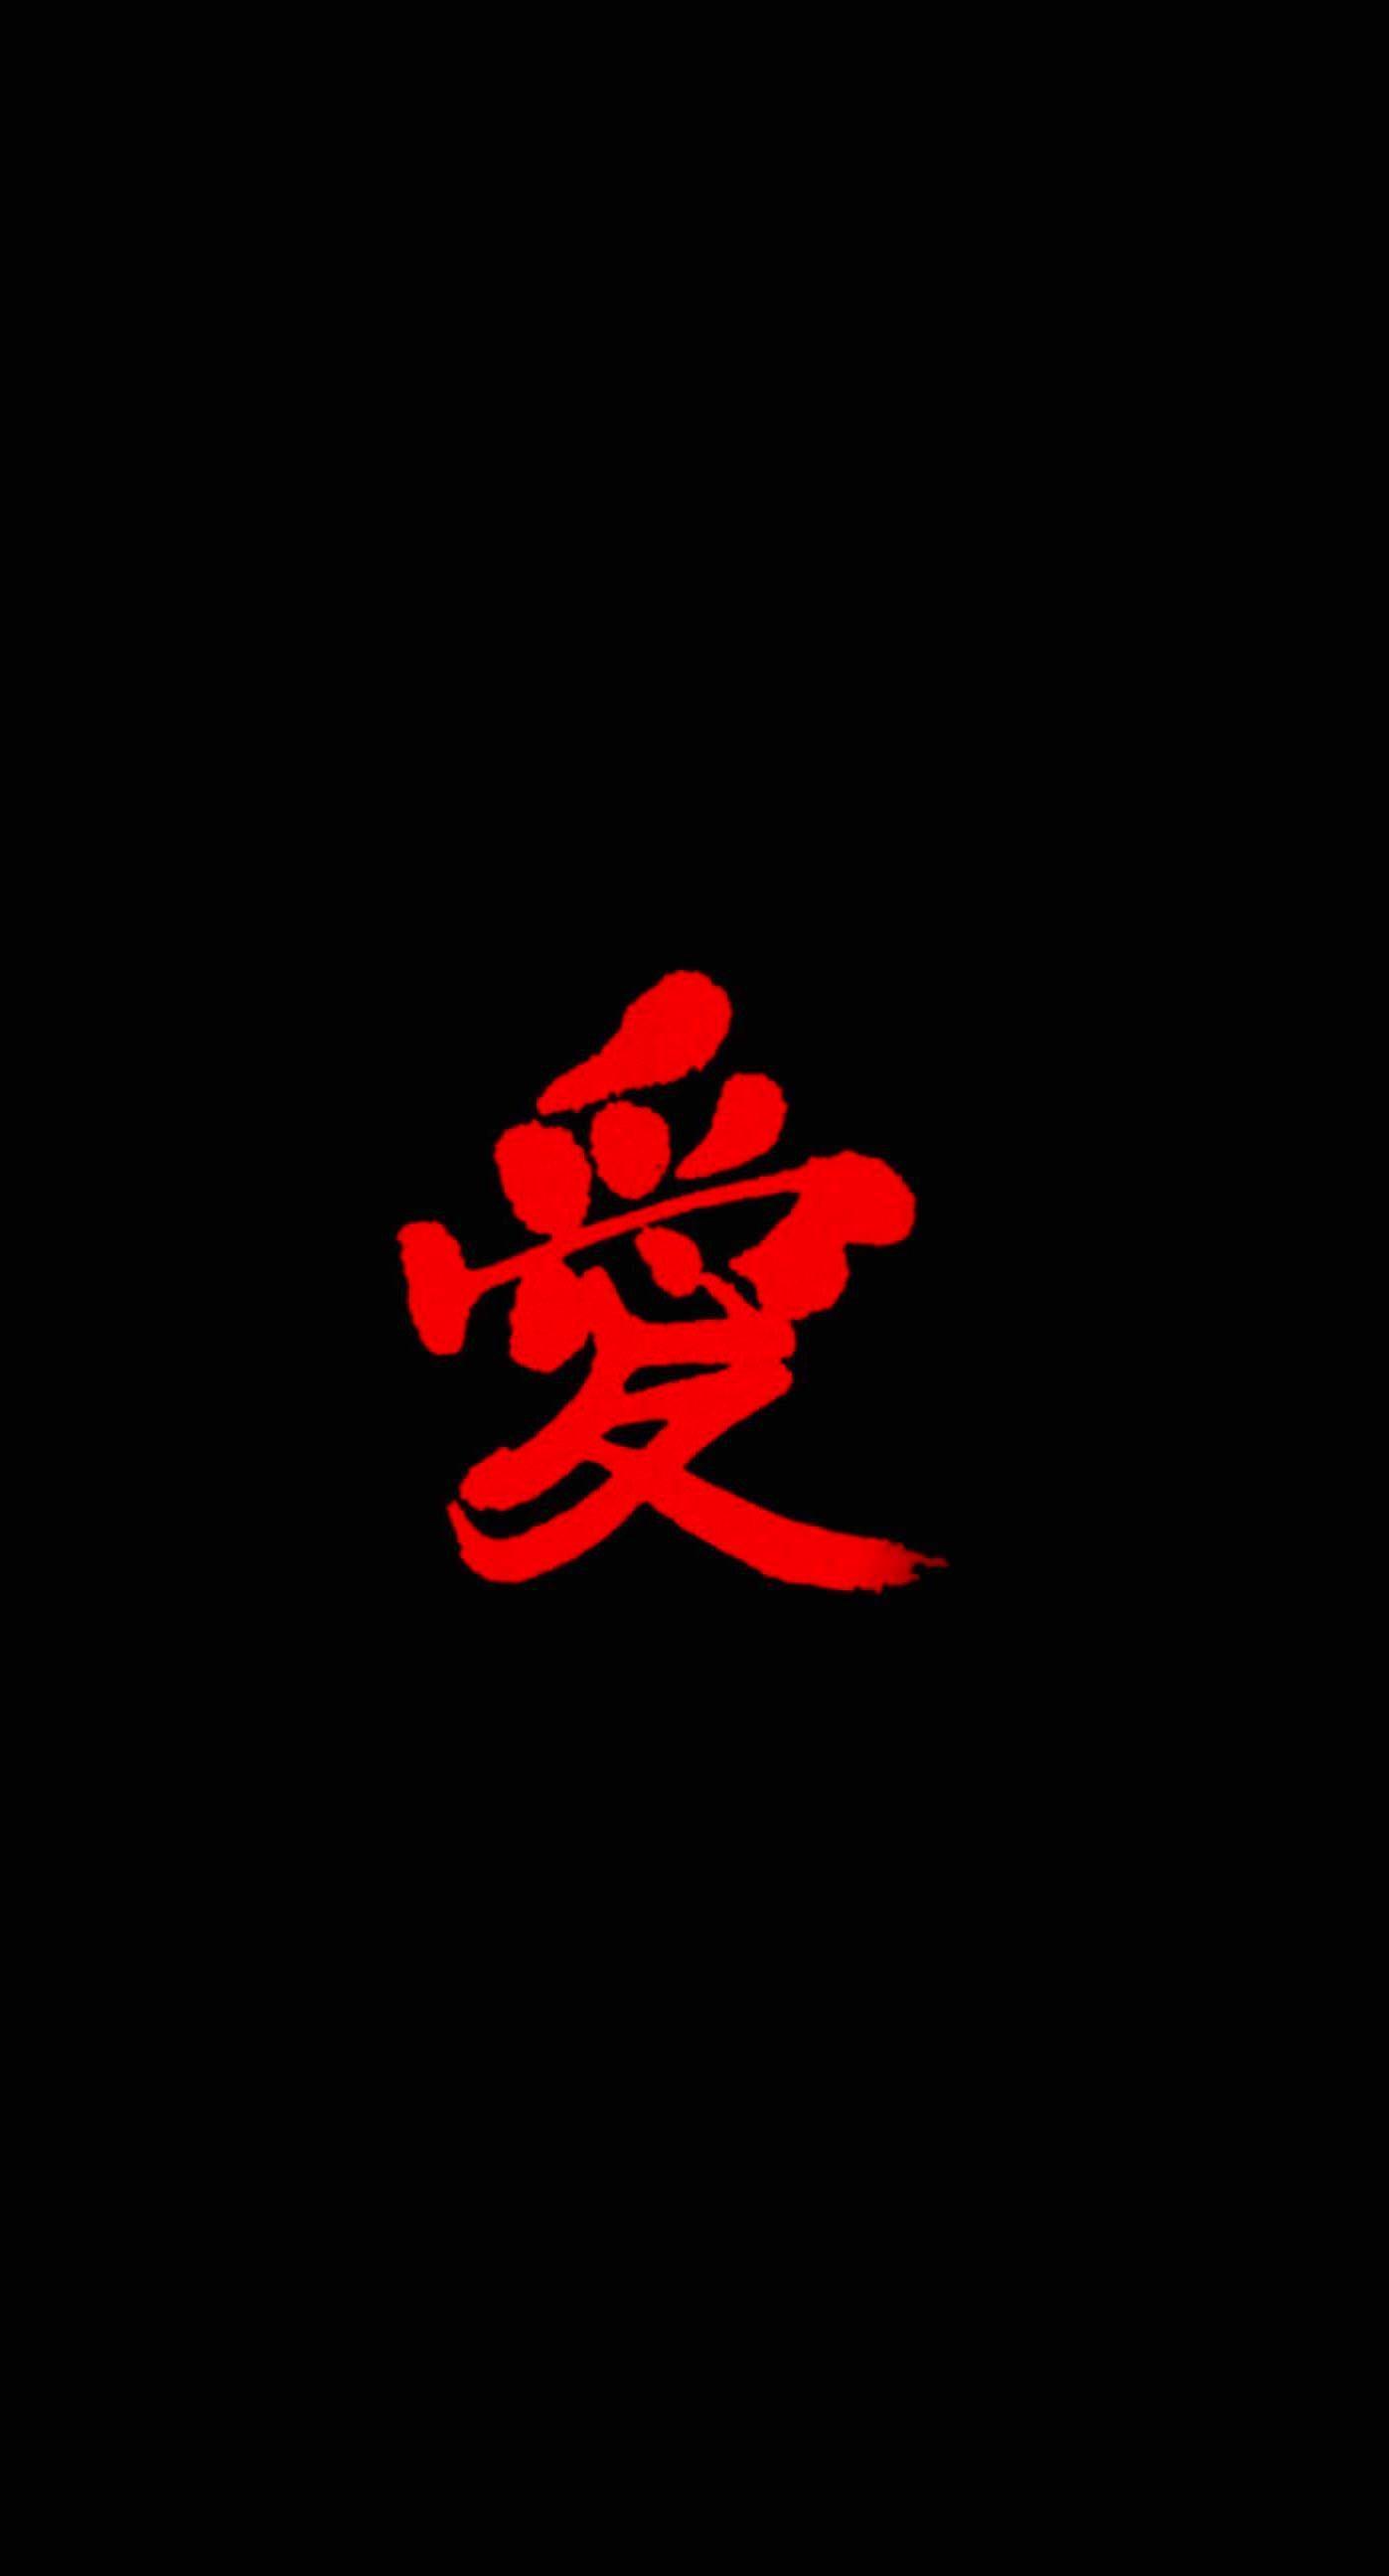 744x1392 Black Red IPhone 5 Parallax Wallpaper